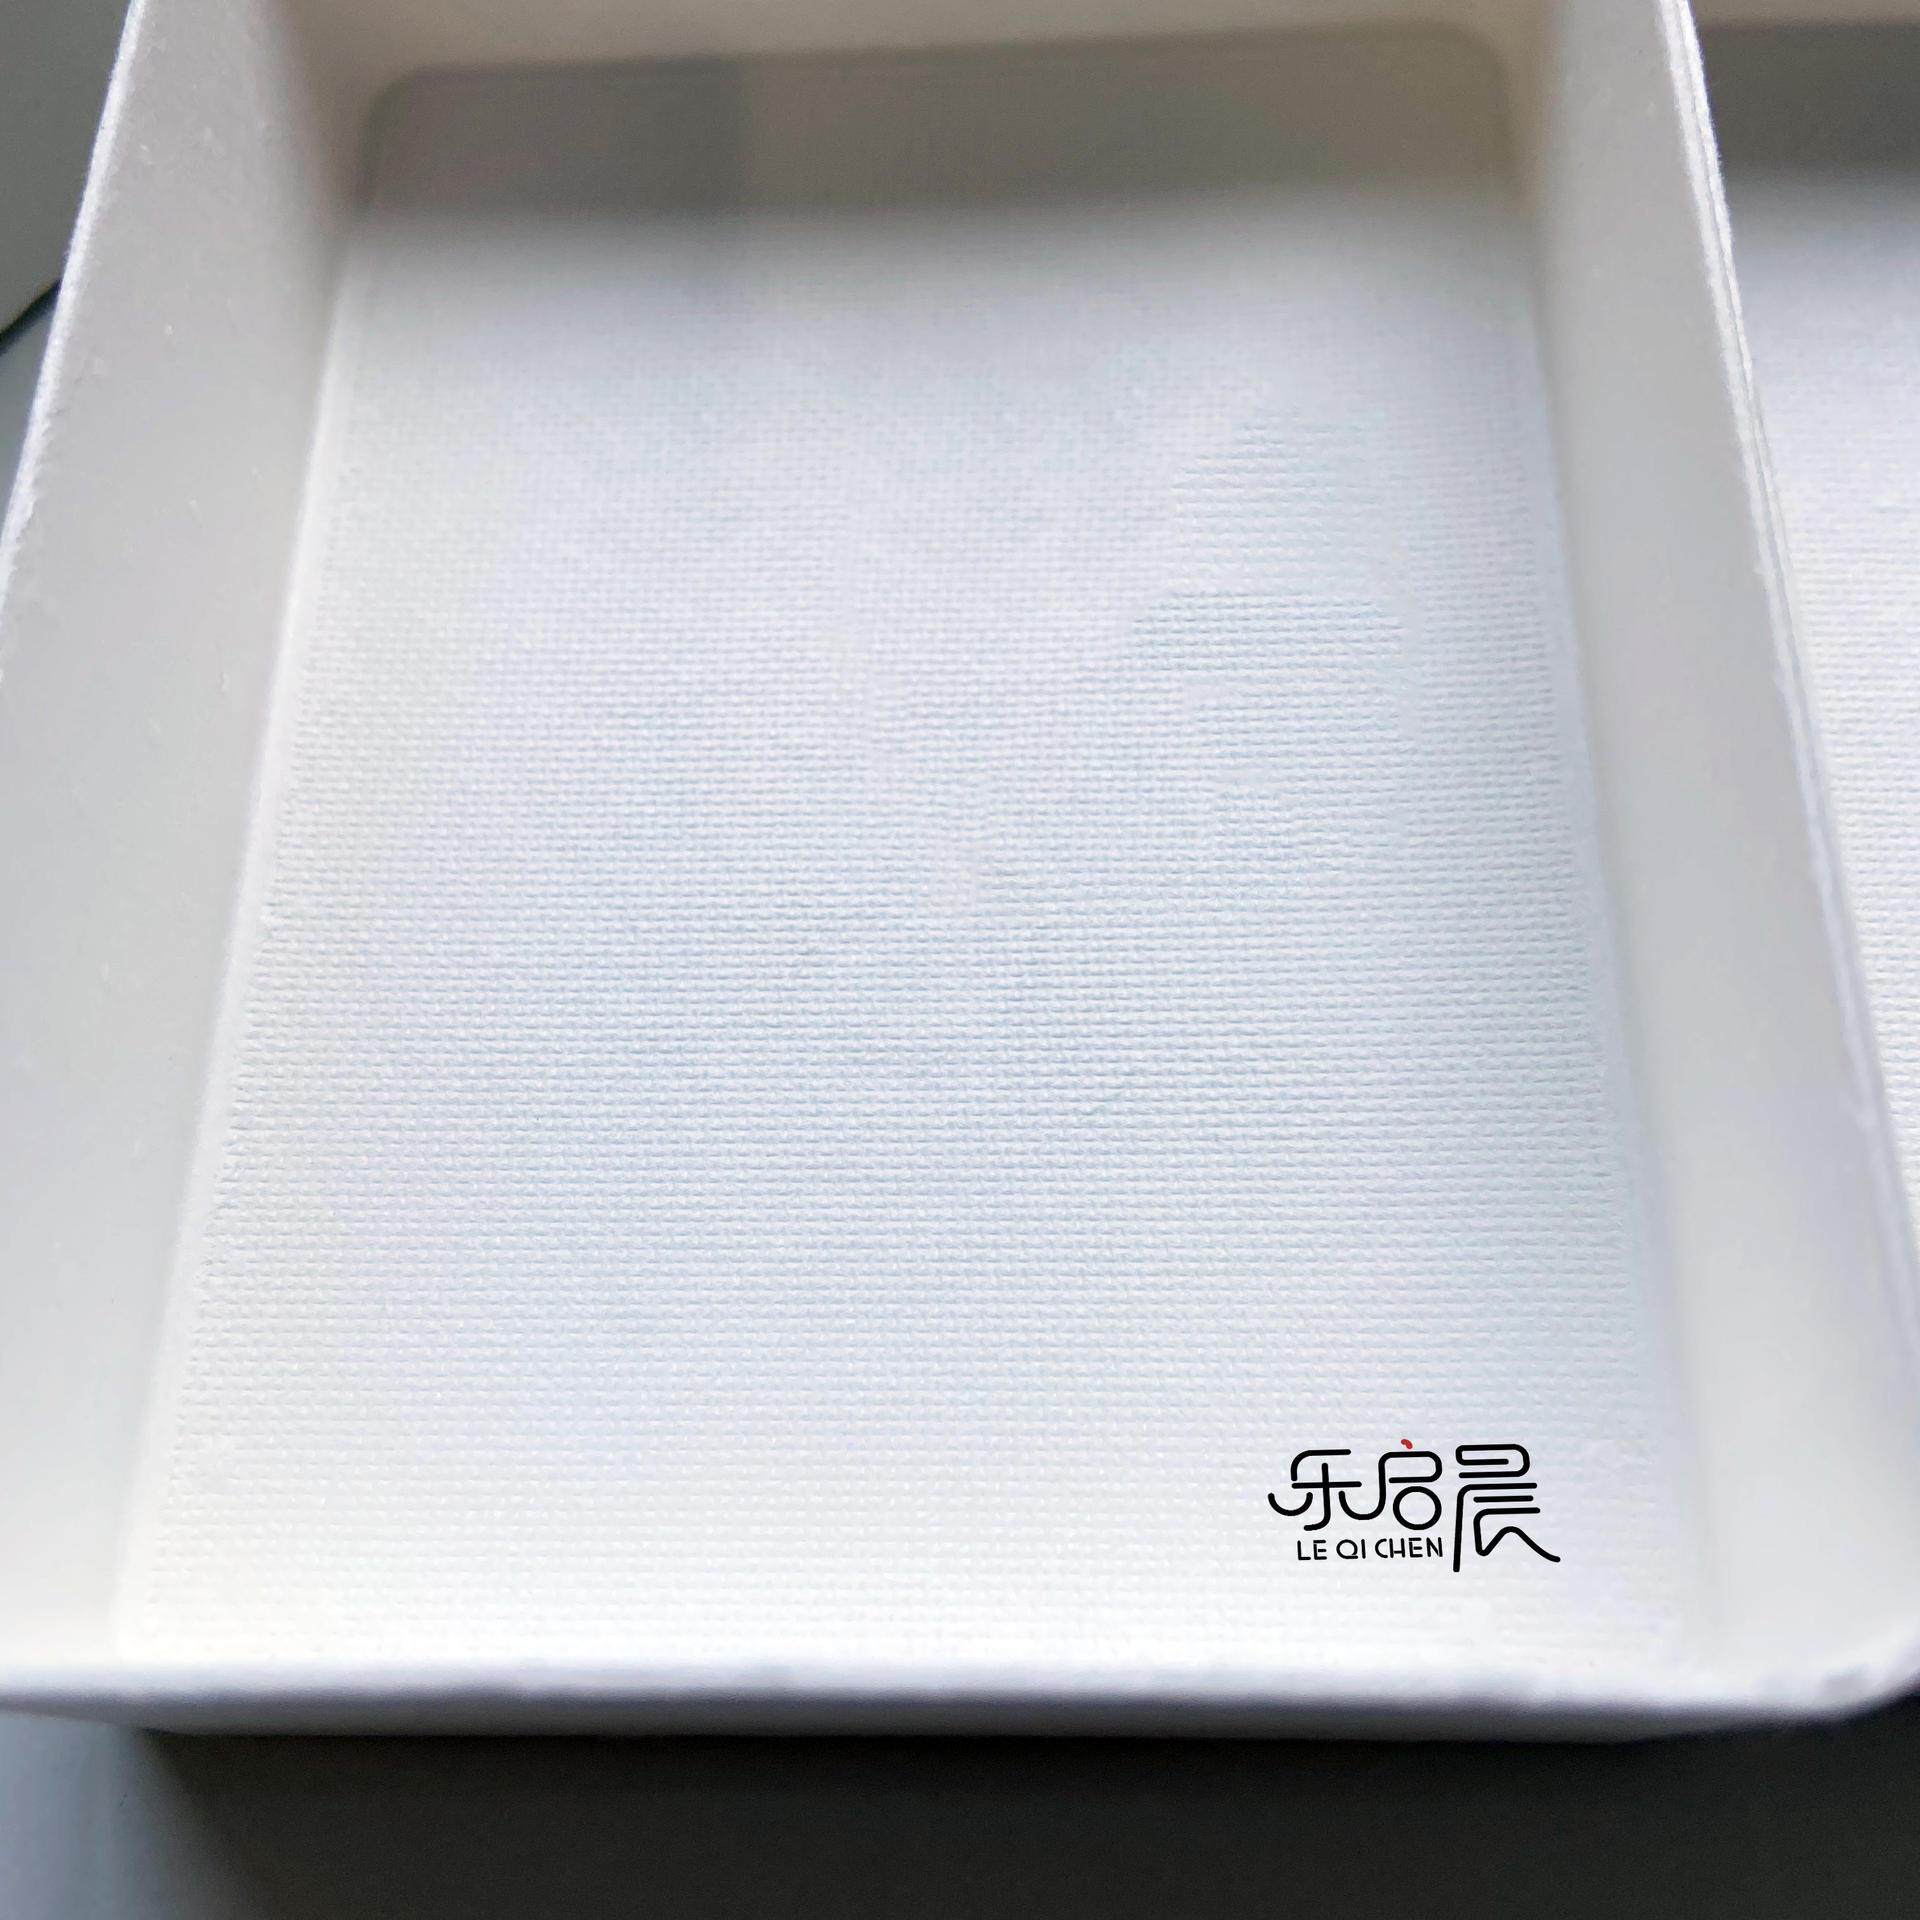 Guangzhou Manufactureramazon jewelry box,paper box,paper gift box with custom logo